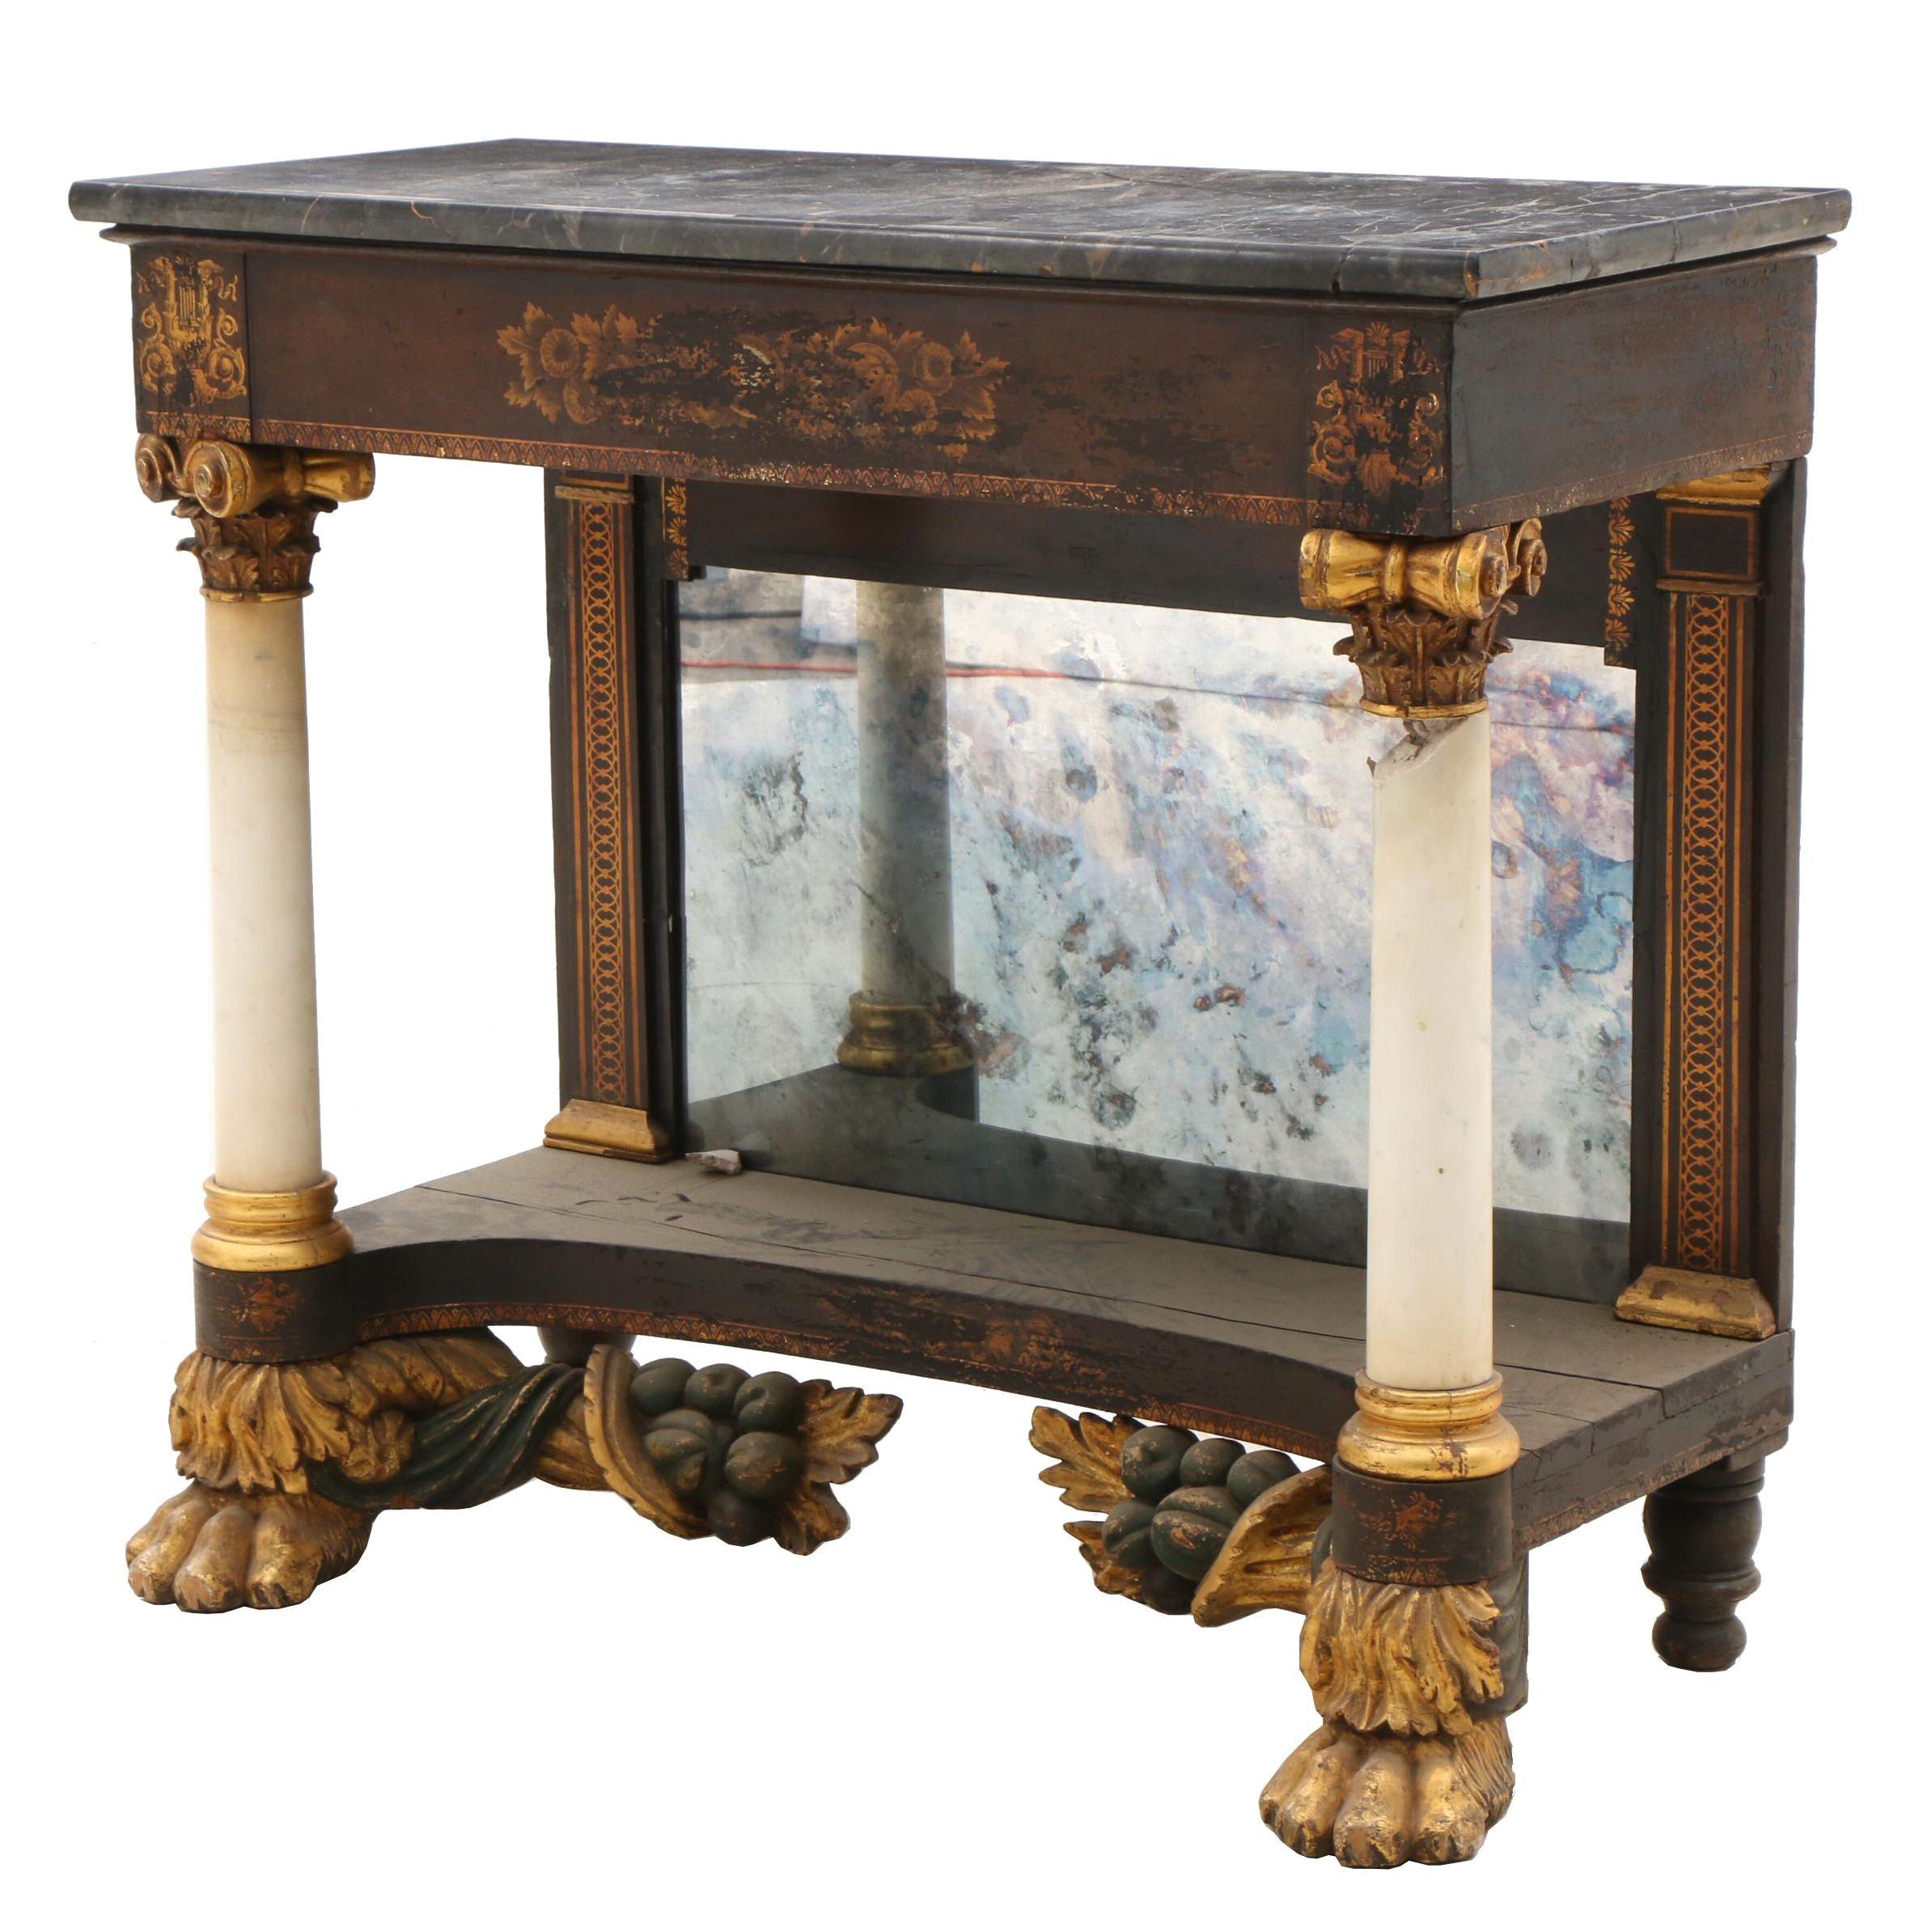 New York Empire Gilt-Stenciled Mahogany and Marble-Top Pier Table, Circa 1825